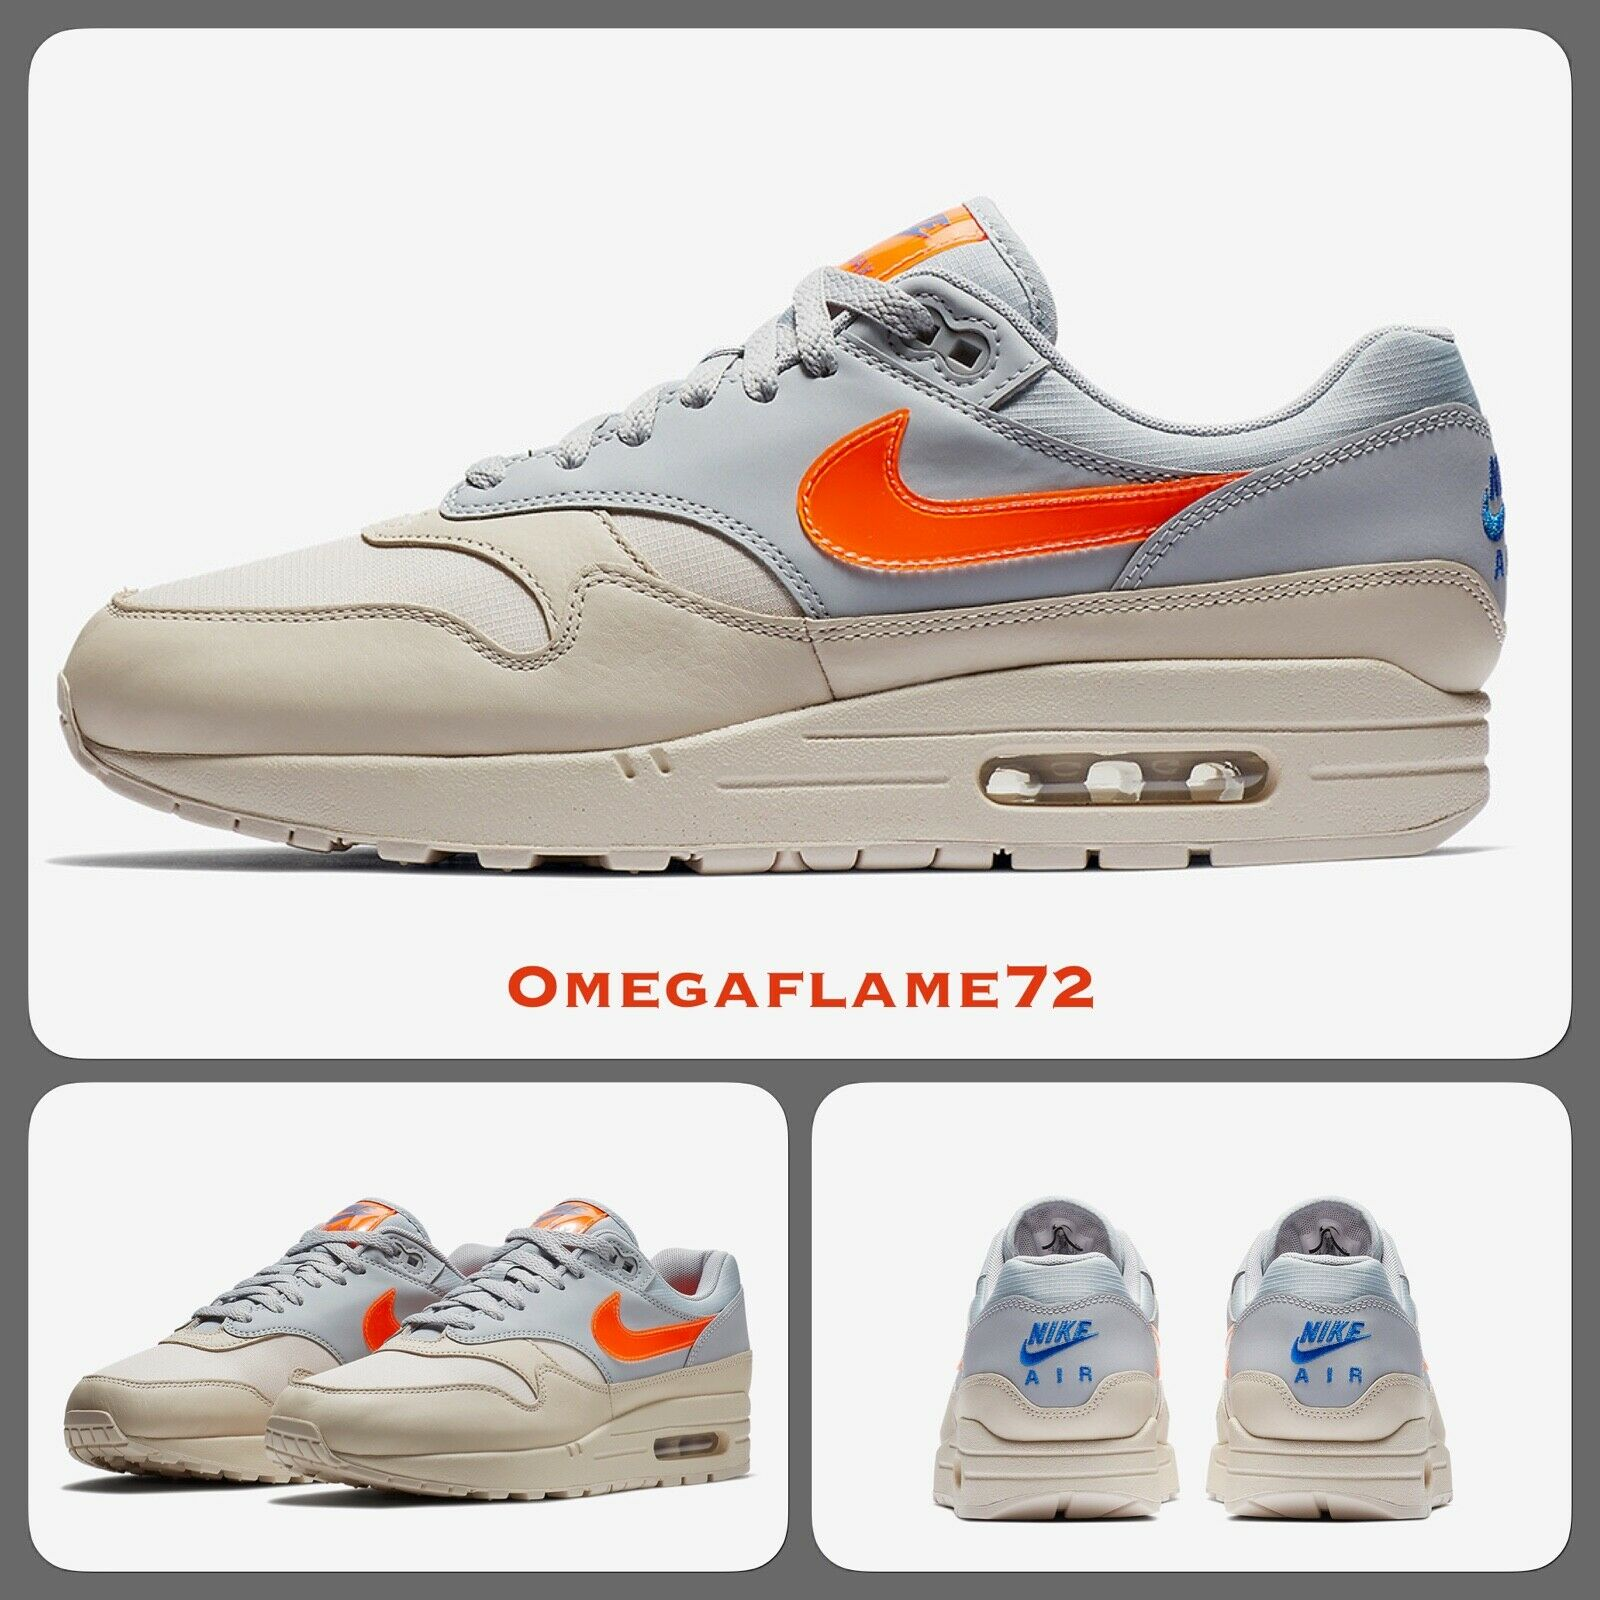 Nike Air Max 1, AR1249-001, UK 6.5, EU EU EU 40.5, US 7.5, Desert Sand, Total Orange f95